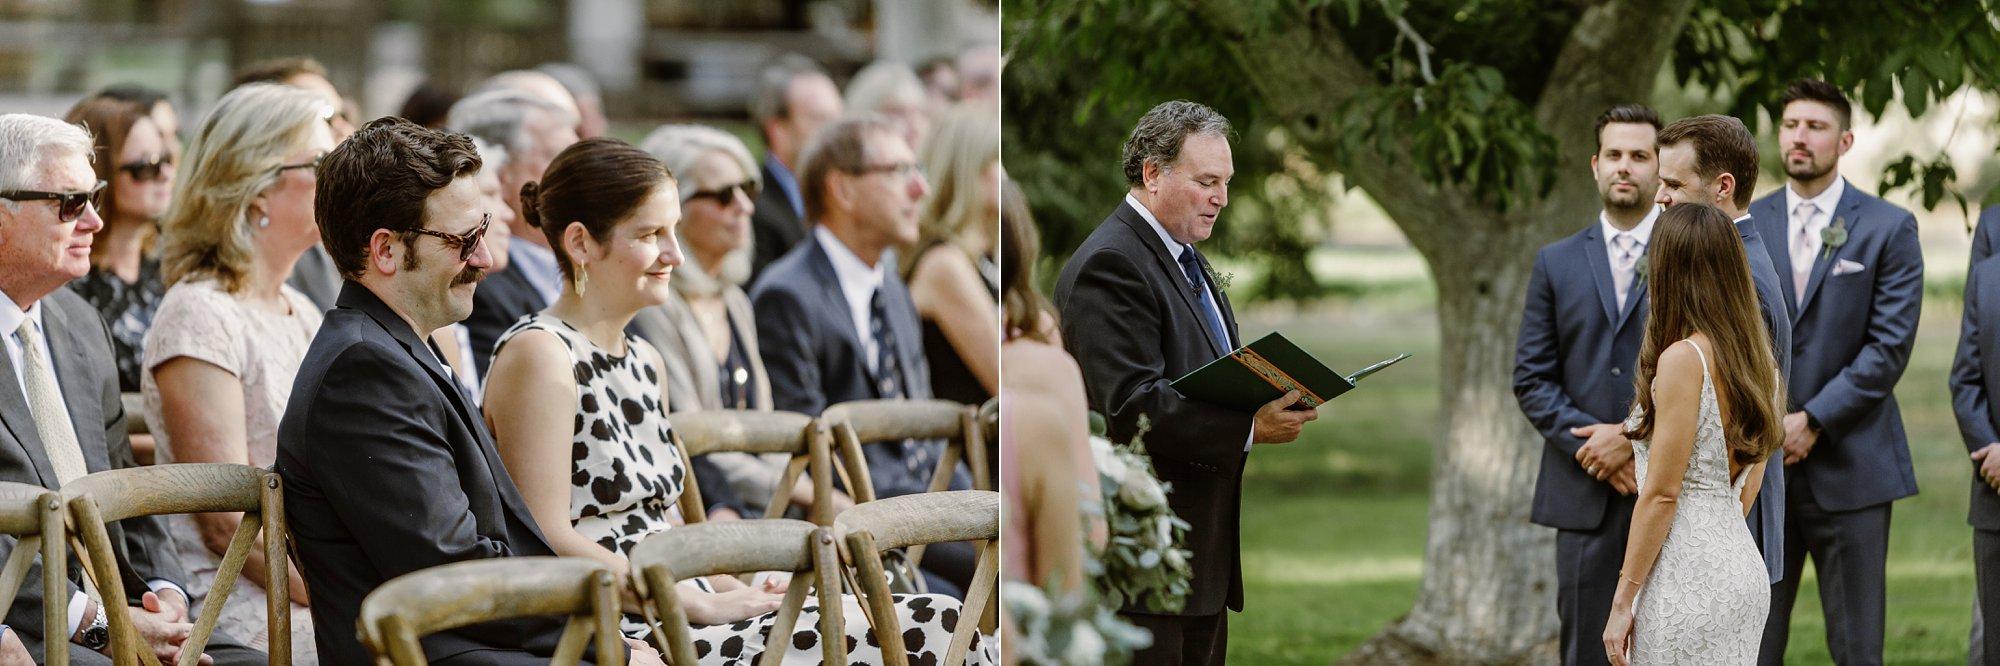 Walnut Grove Moorpark California Wedding_0035.jpg